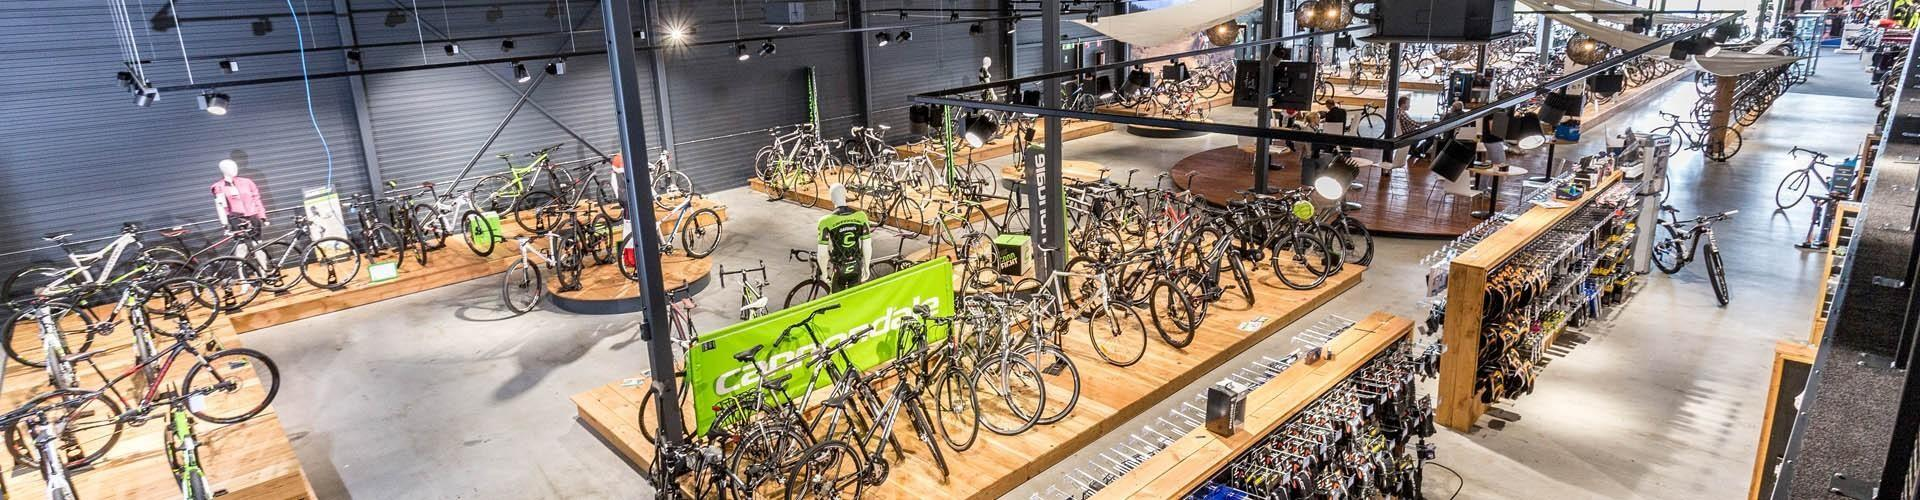 banner-fietsen.jpg